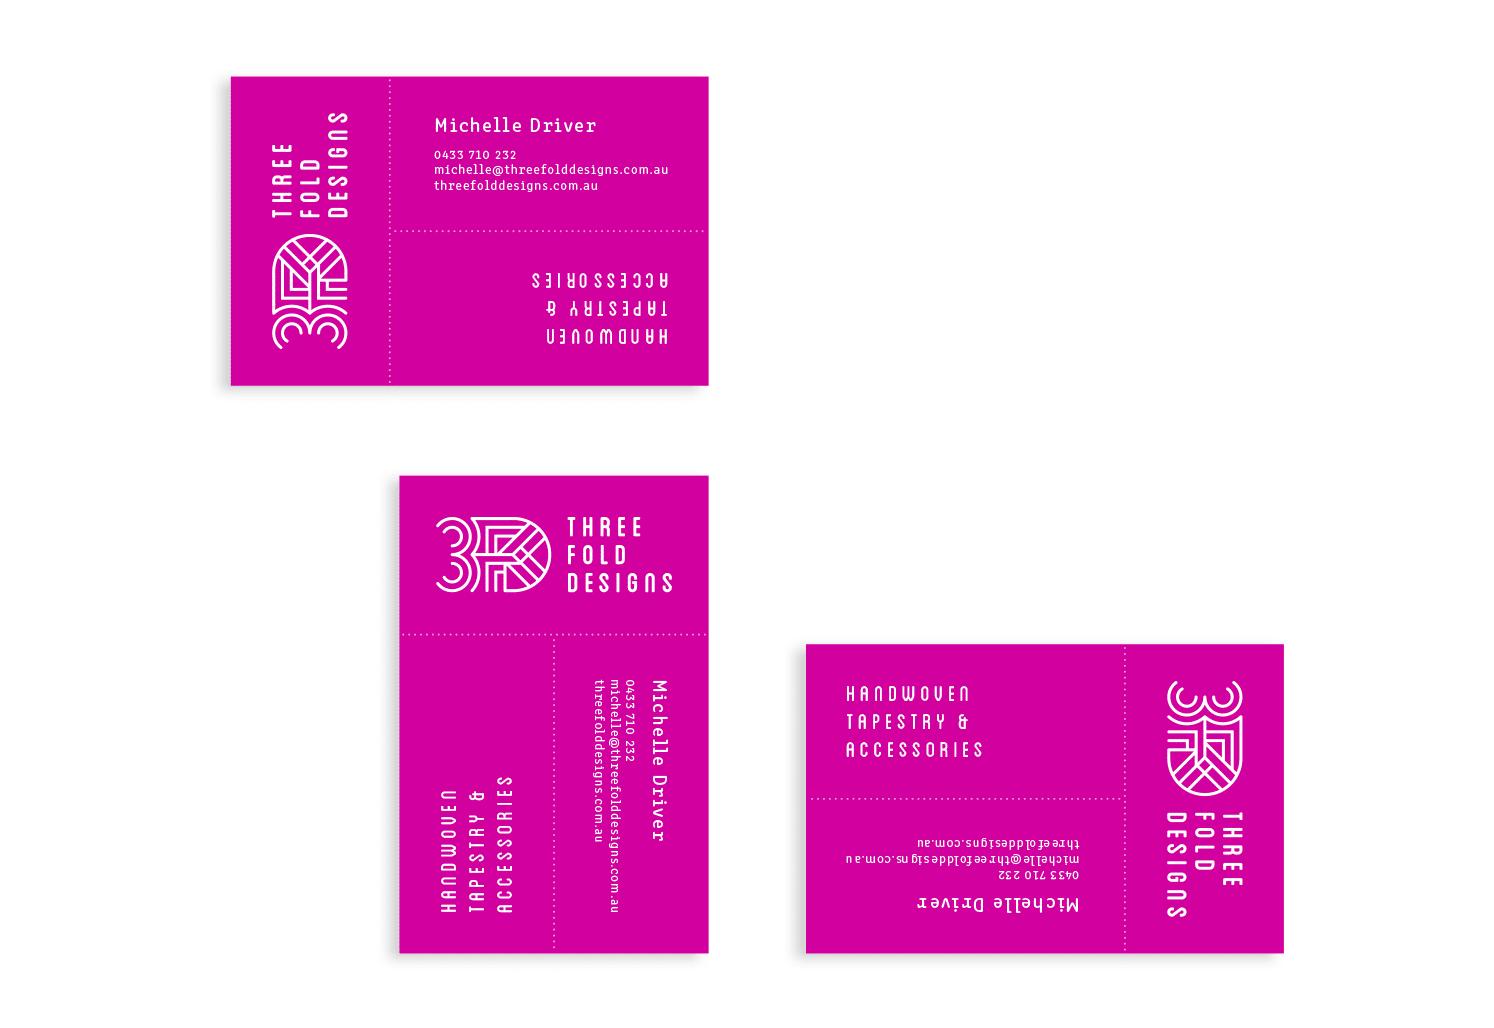 Threeefold-Design-business card design adelaide